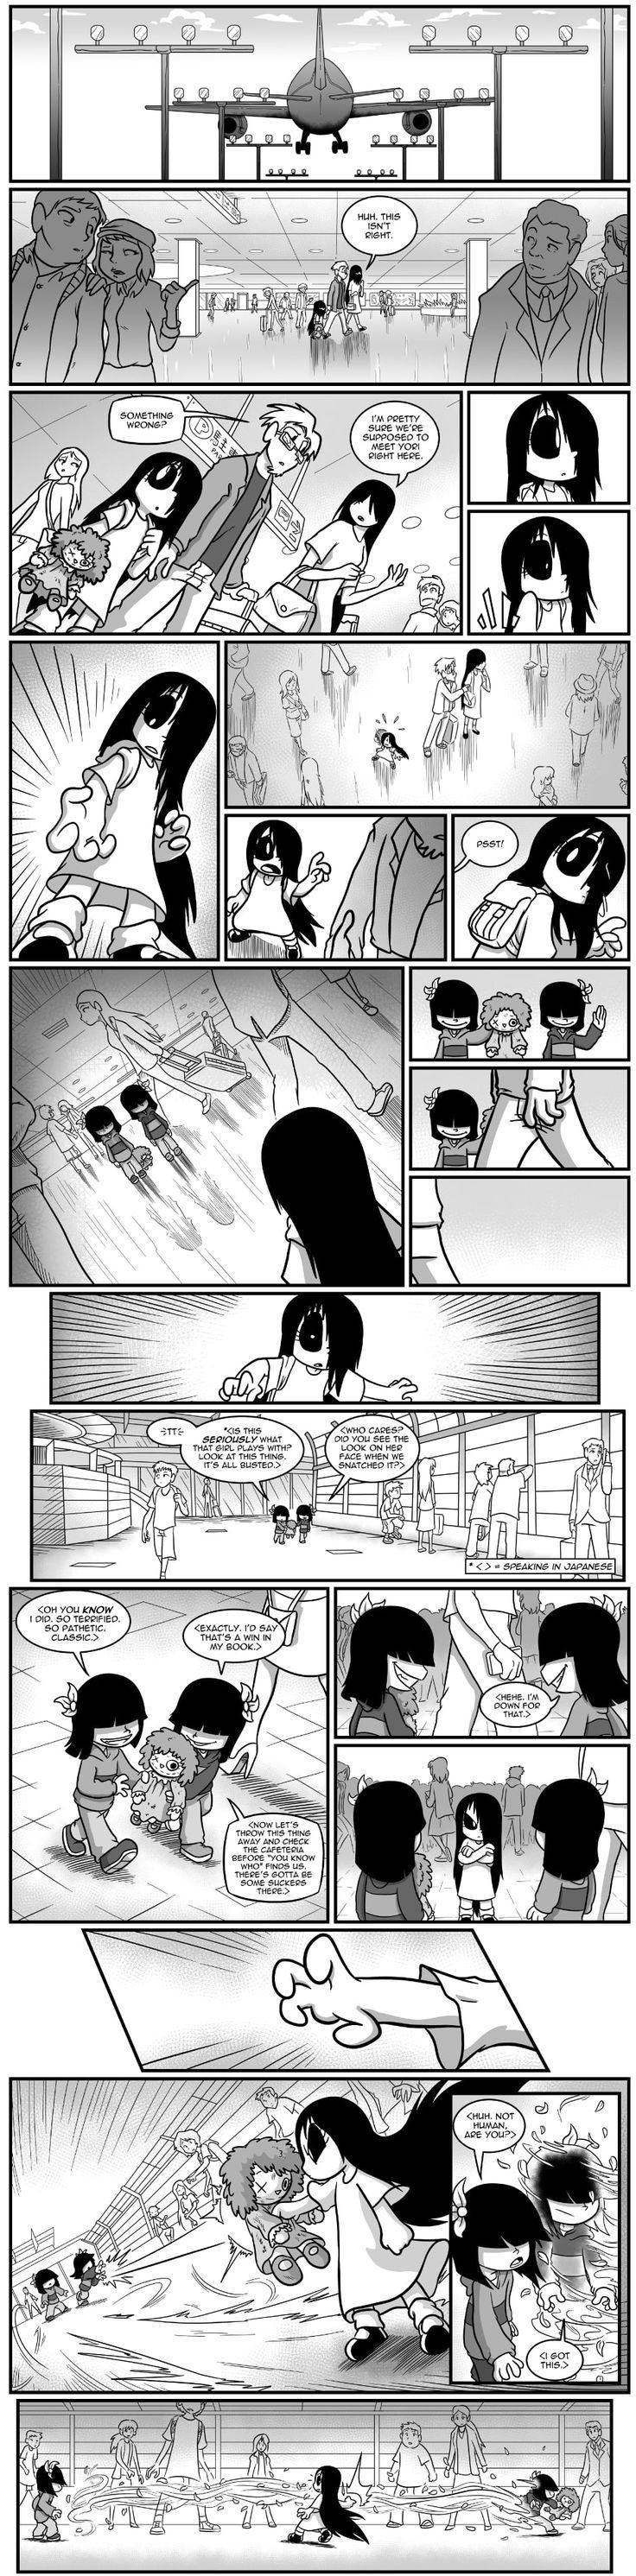 Erma :: Erma- The Family Reunion Part 5 | Tapas - image 1